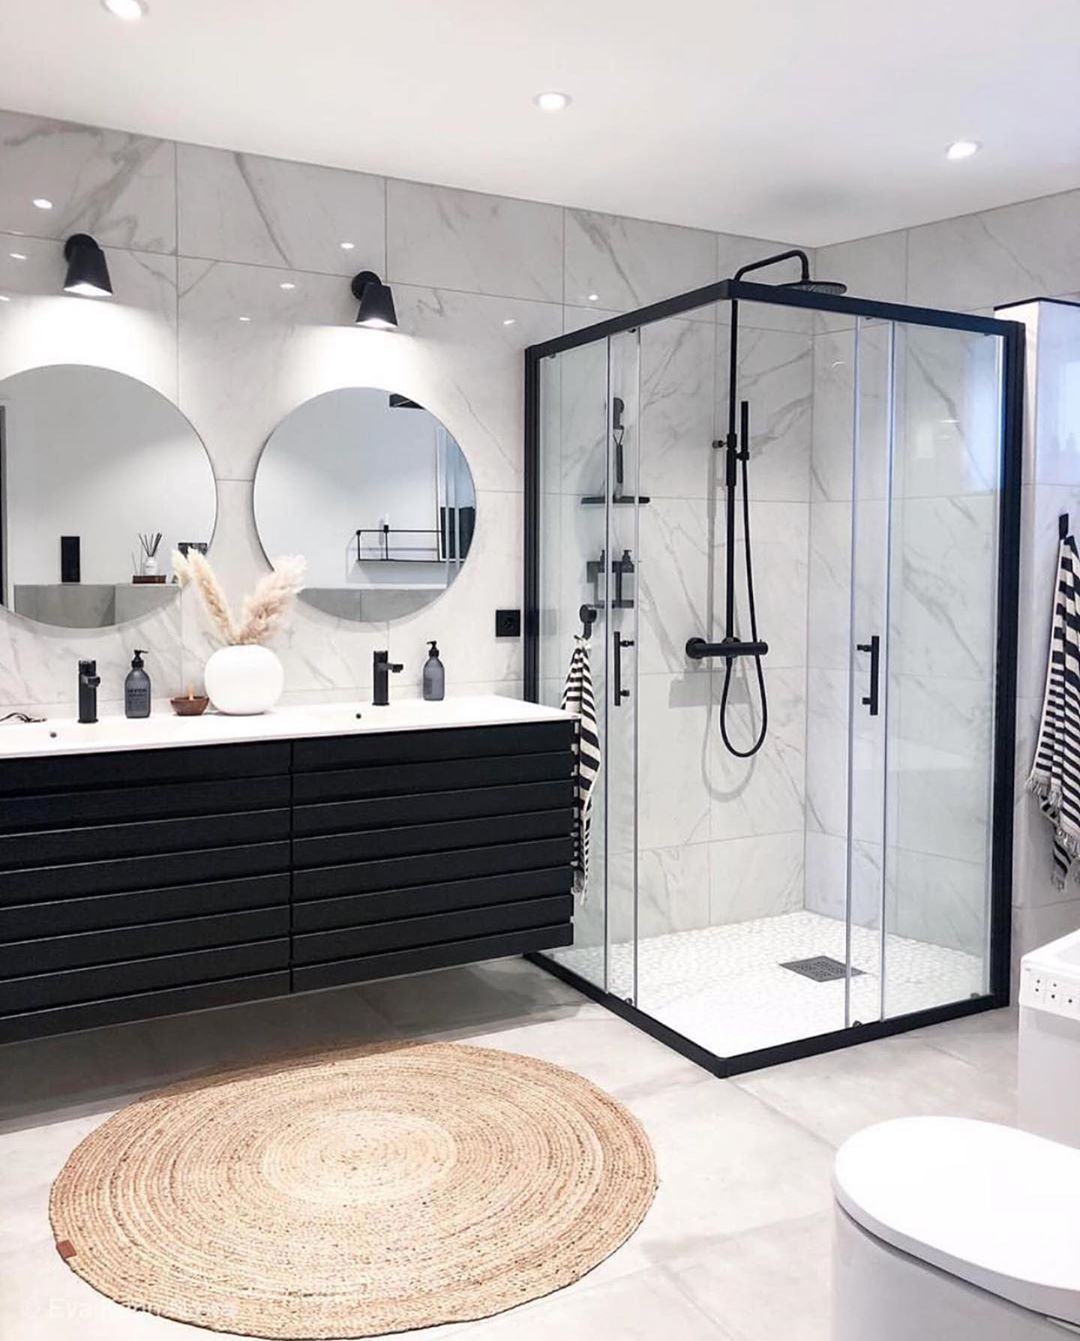 Beyza Cebeci On Instagram Bathroom Interior Interiordesign Desi Idee Salle De Bain Salle De Bain Design Amenagement Salle De Bain